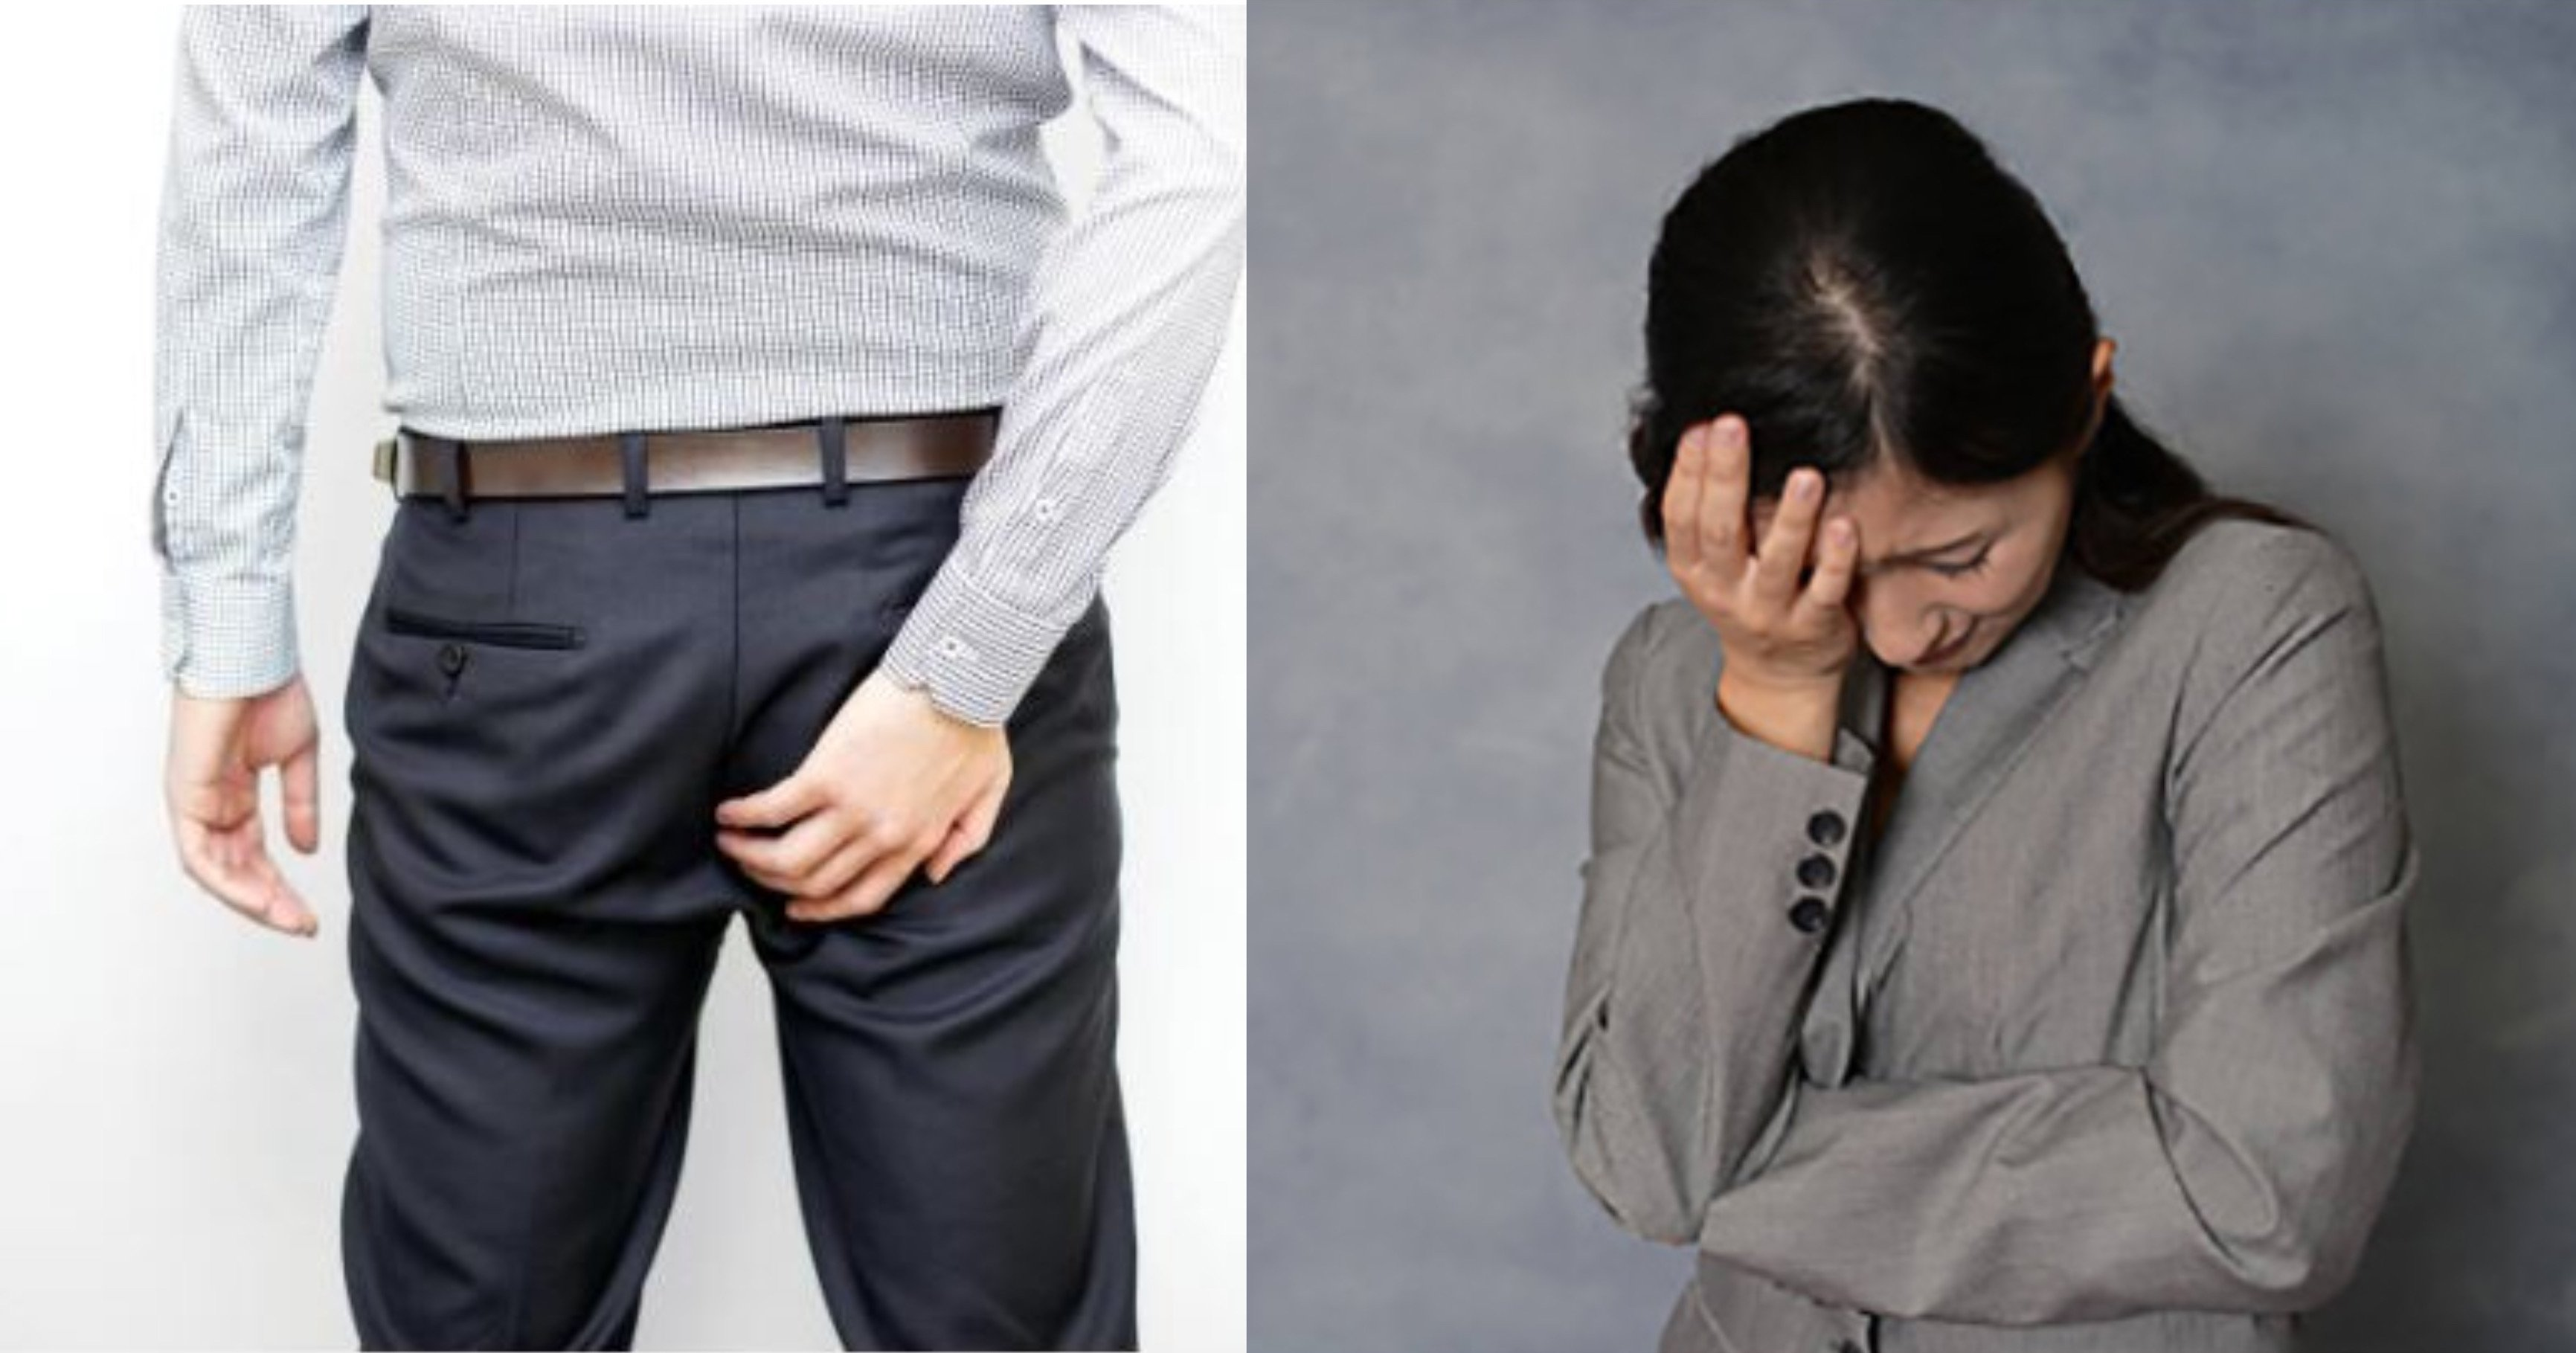 "ebb0a9eab780 ec8db8eb84ac.jpg?resize=1200,630 - ""냄새 난다고!!!!...""...한 방에서 똥방귀 뀌는 아빠에게 분노해 얼굴 피날 때까지 폭행한 여성"